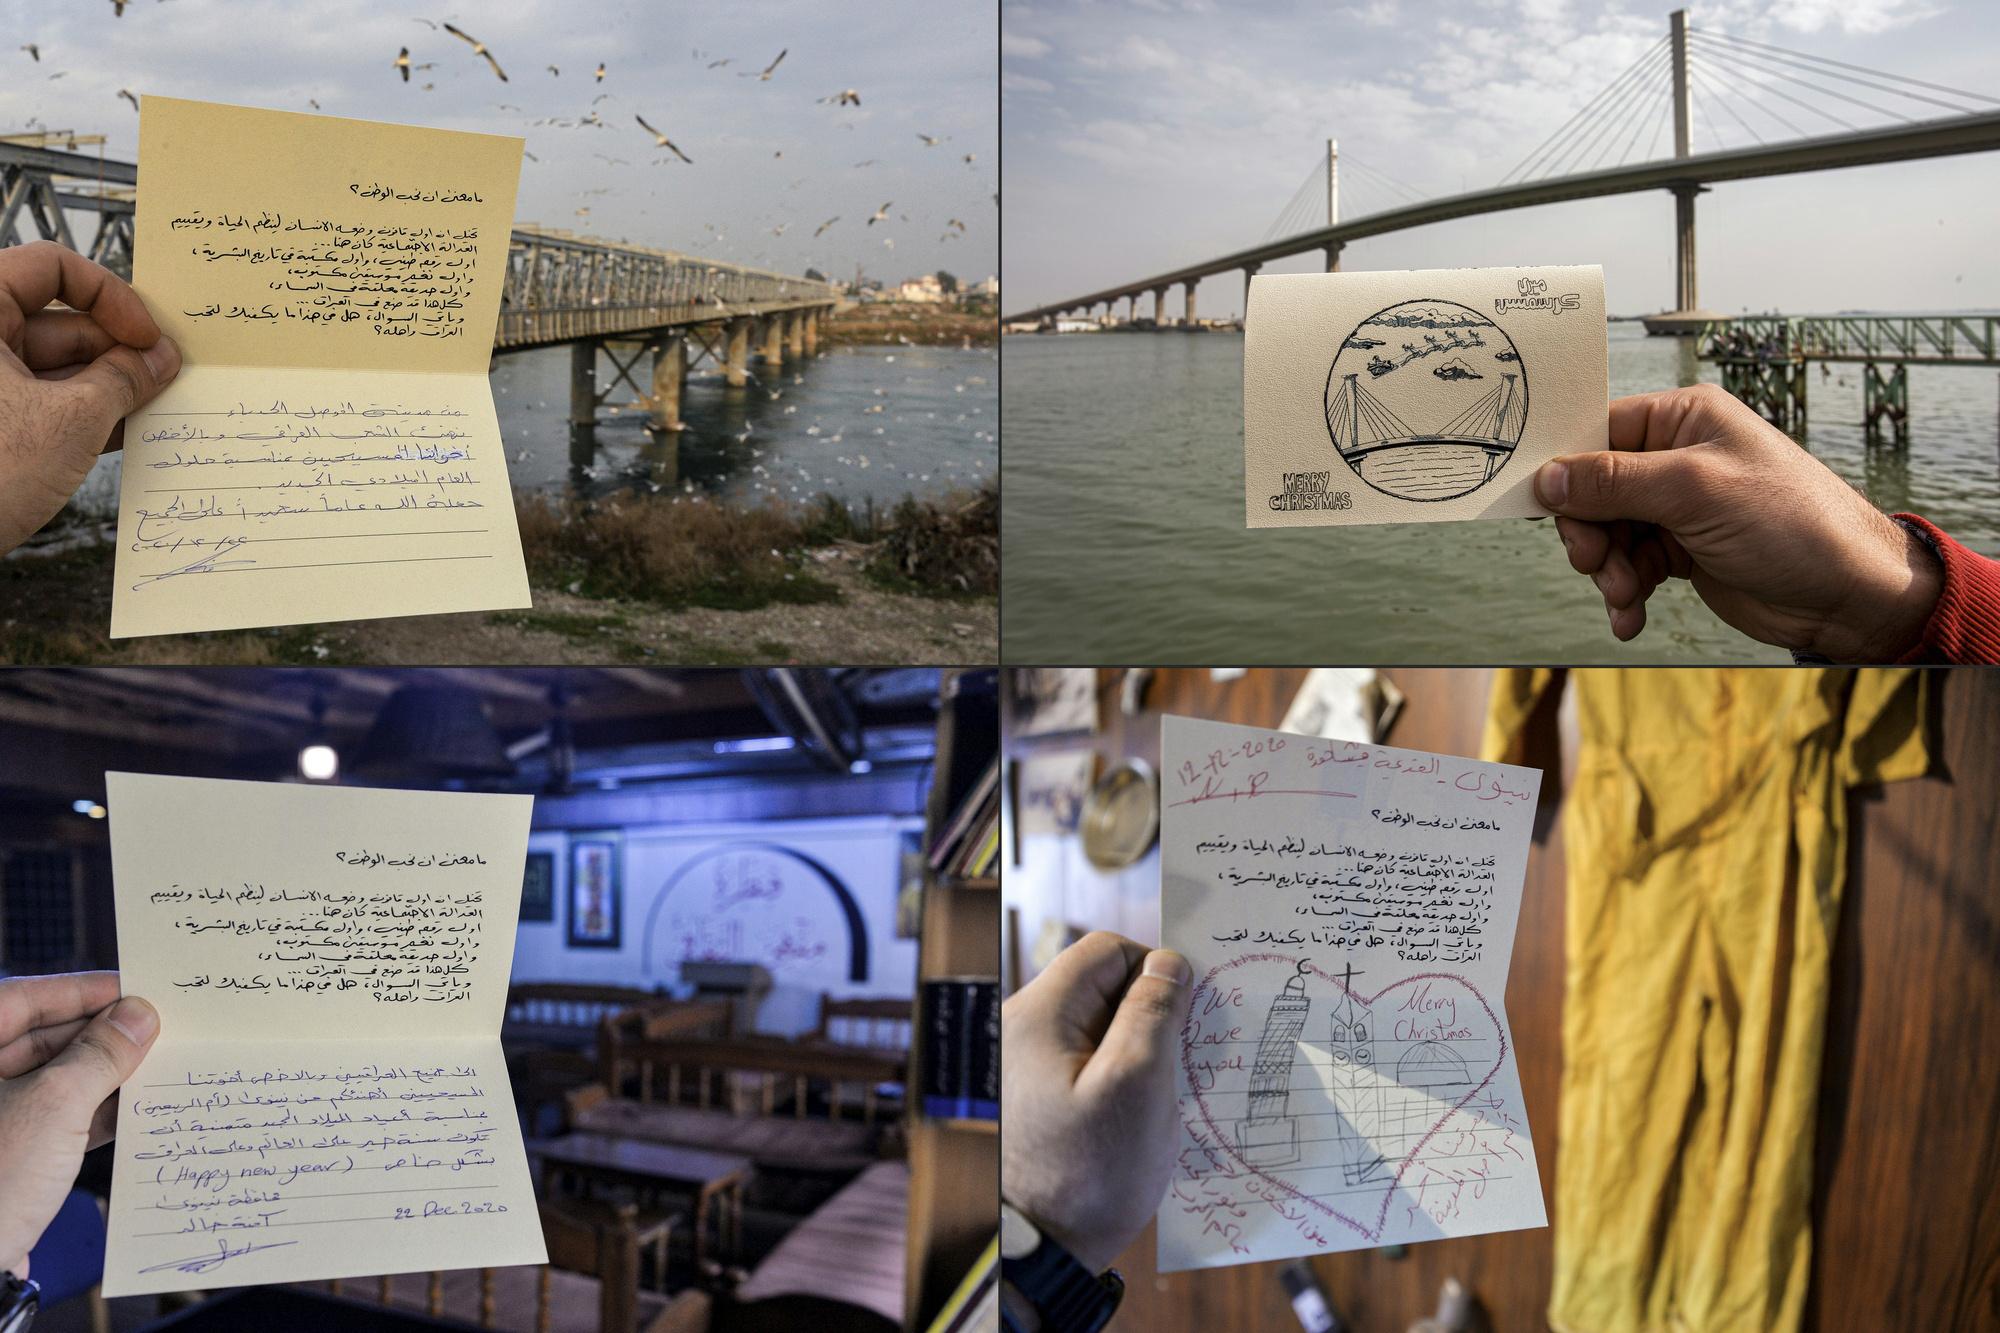 Cartes de voeux envoyées aux résidents de Qaraqosh, Zaid AL-OBEIDI, Hussein FALEH / AFP